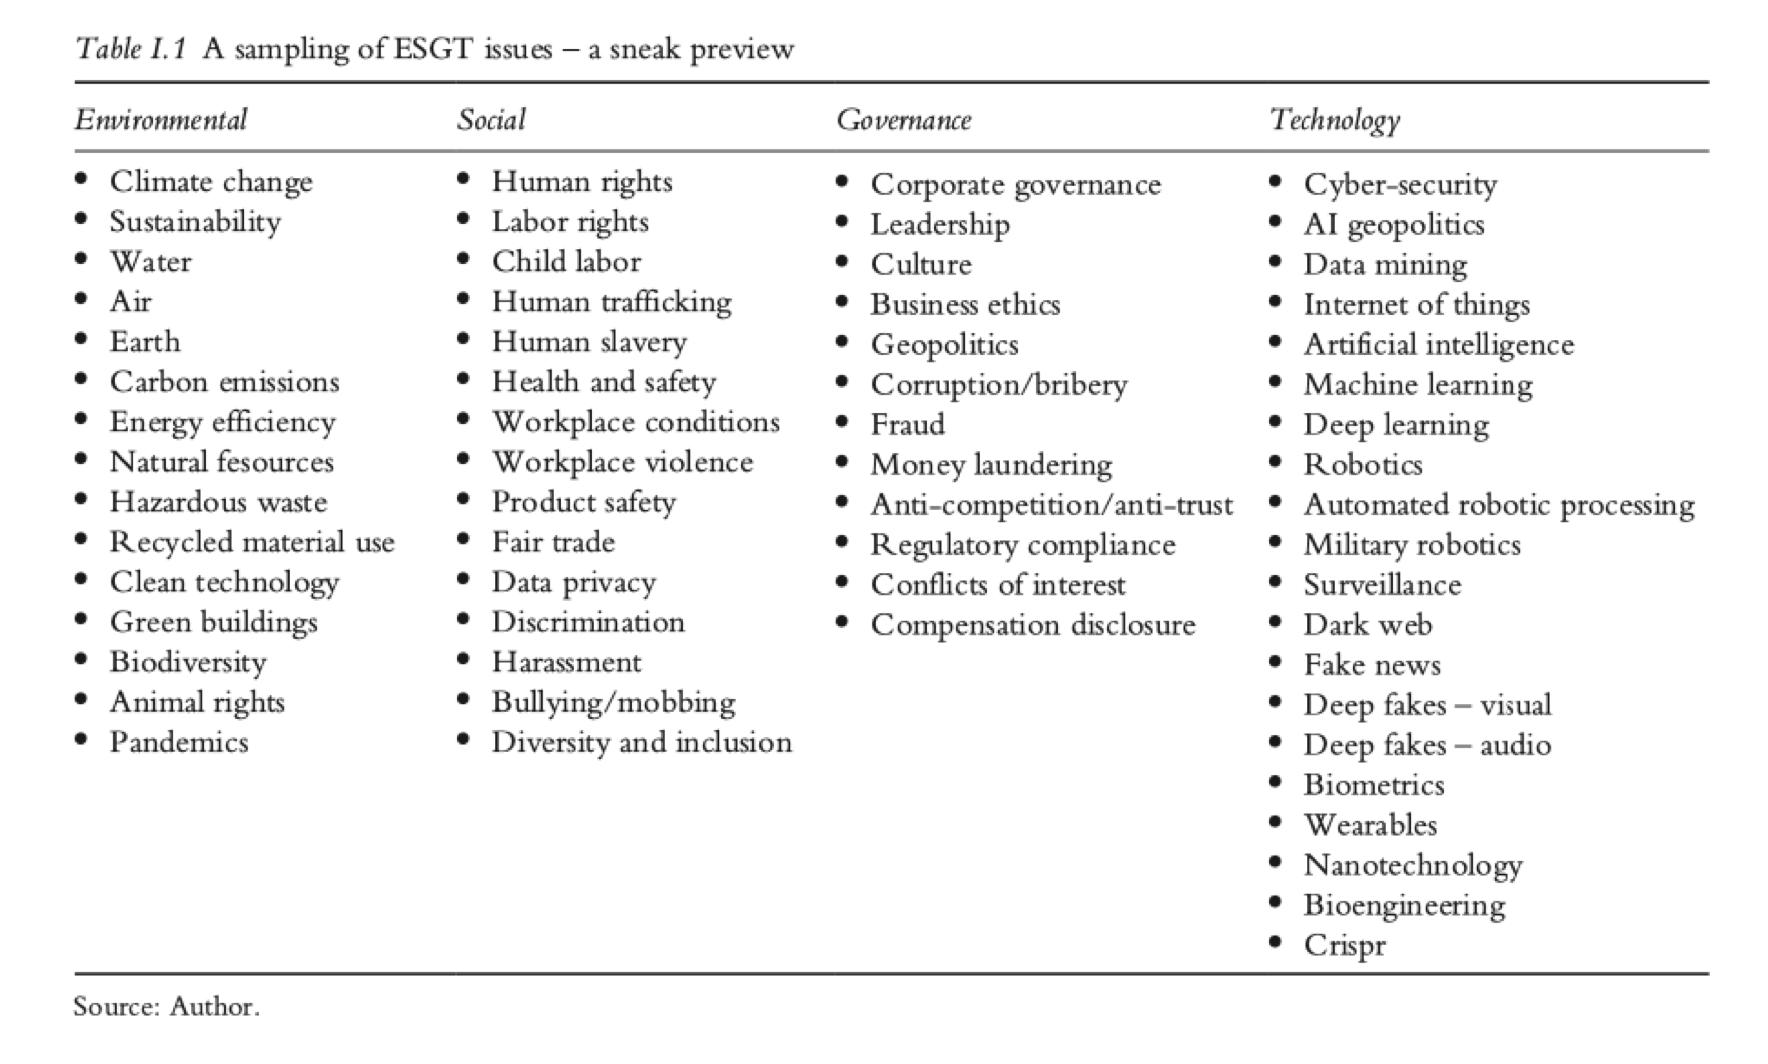 A sampling of ESGT issues